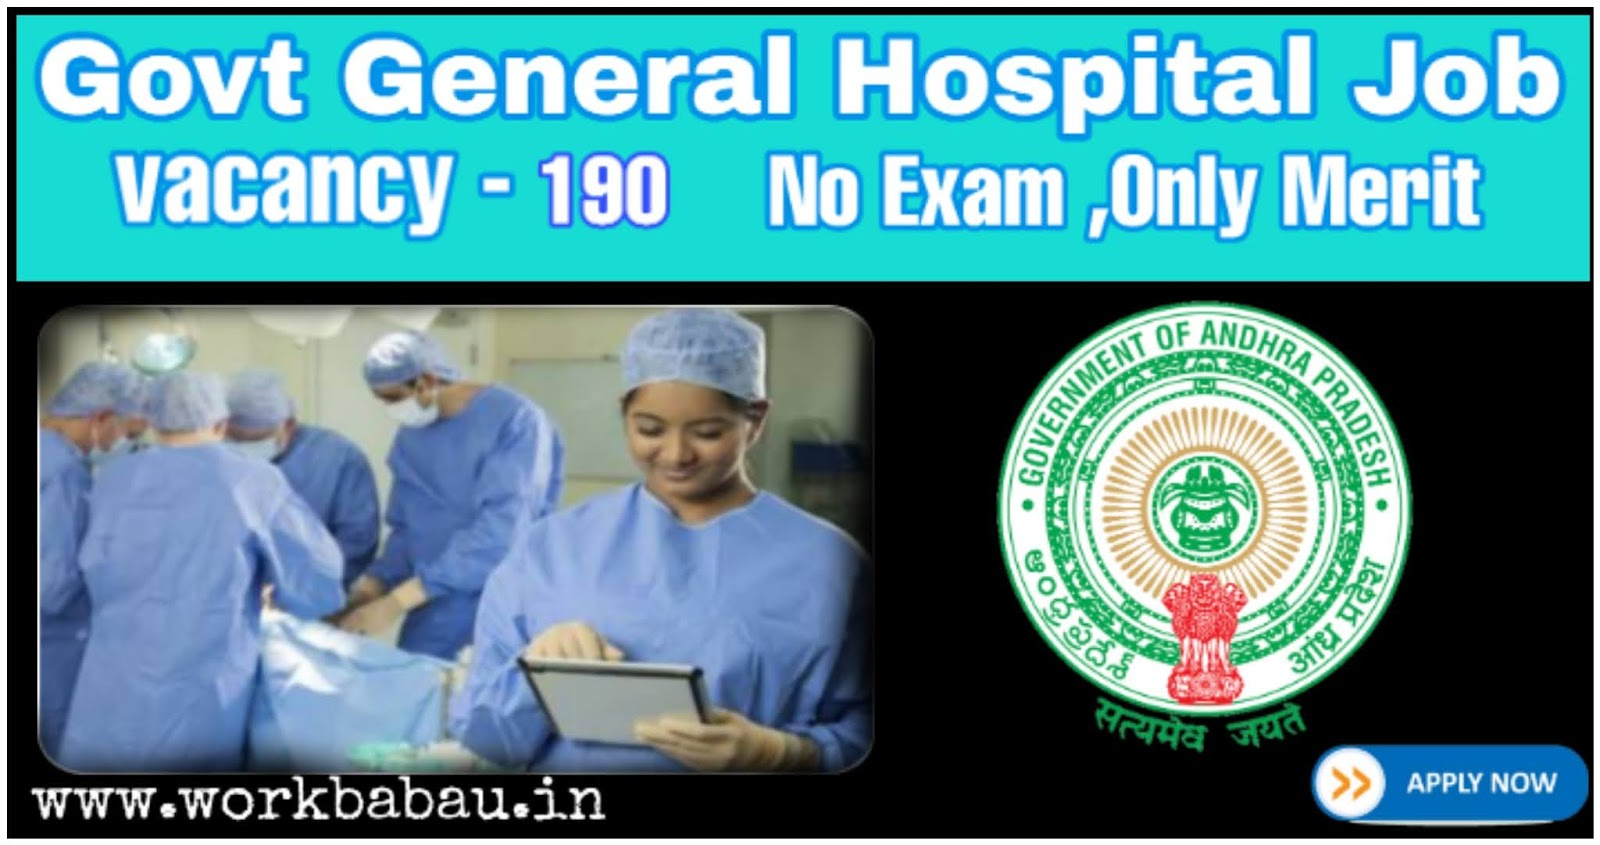 Govt General Hospital Recruitment 2020